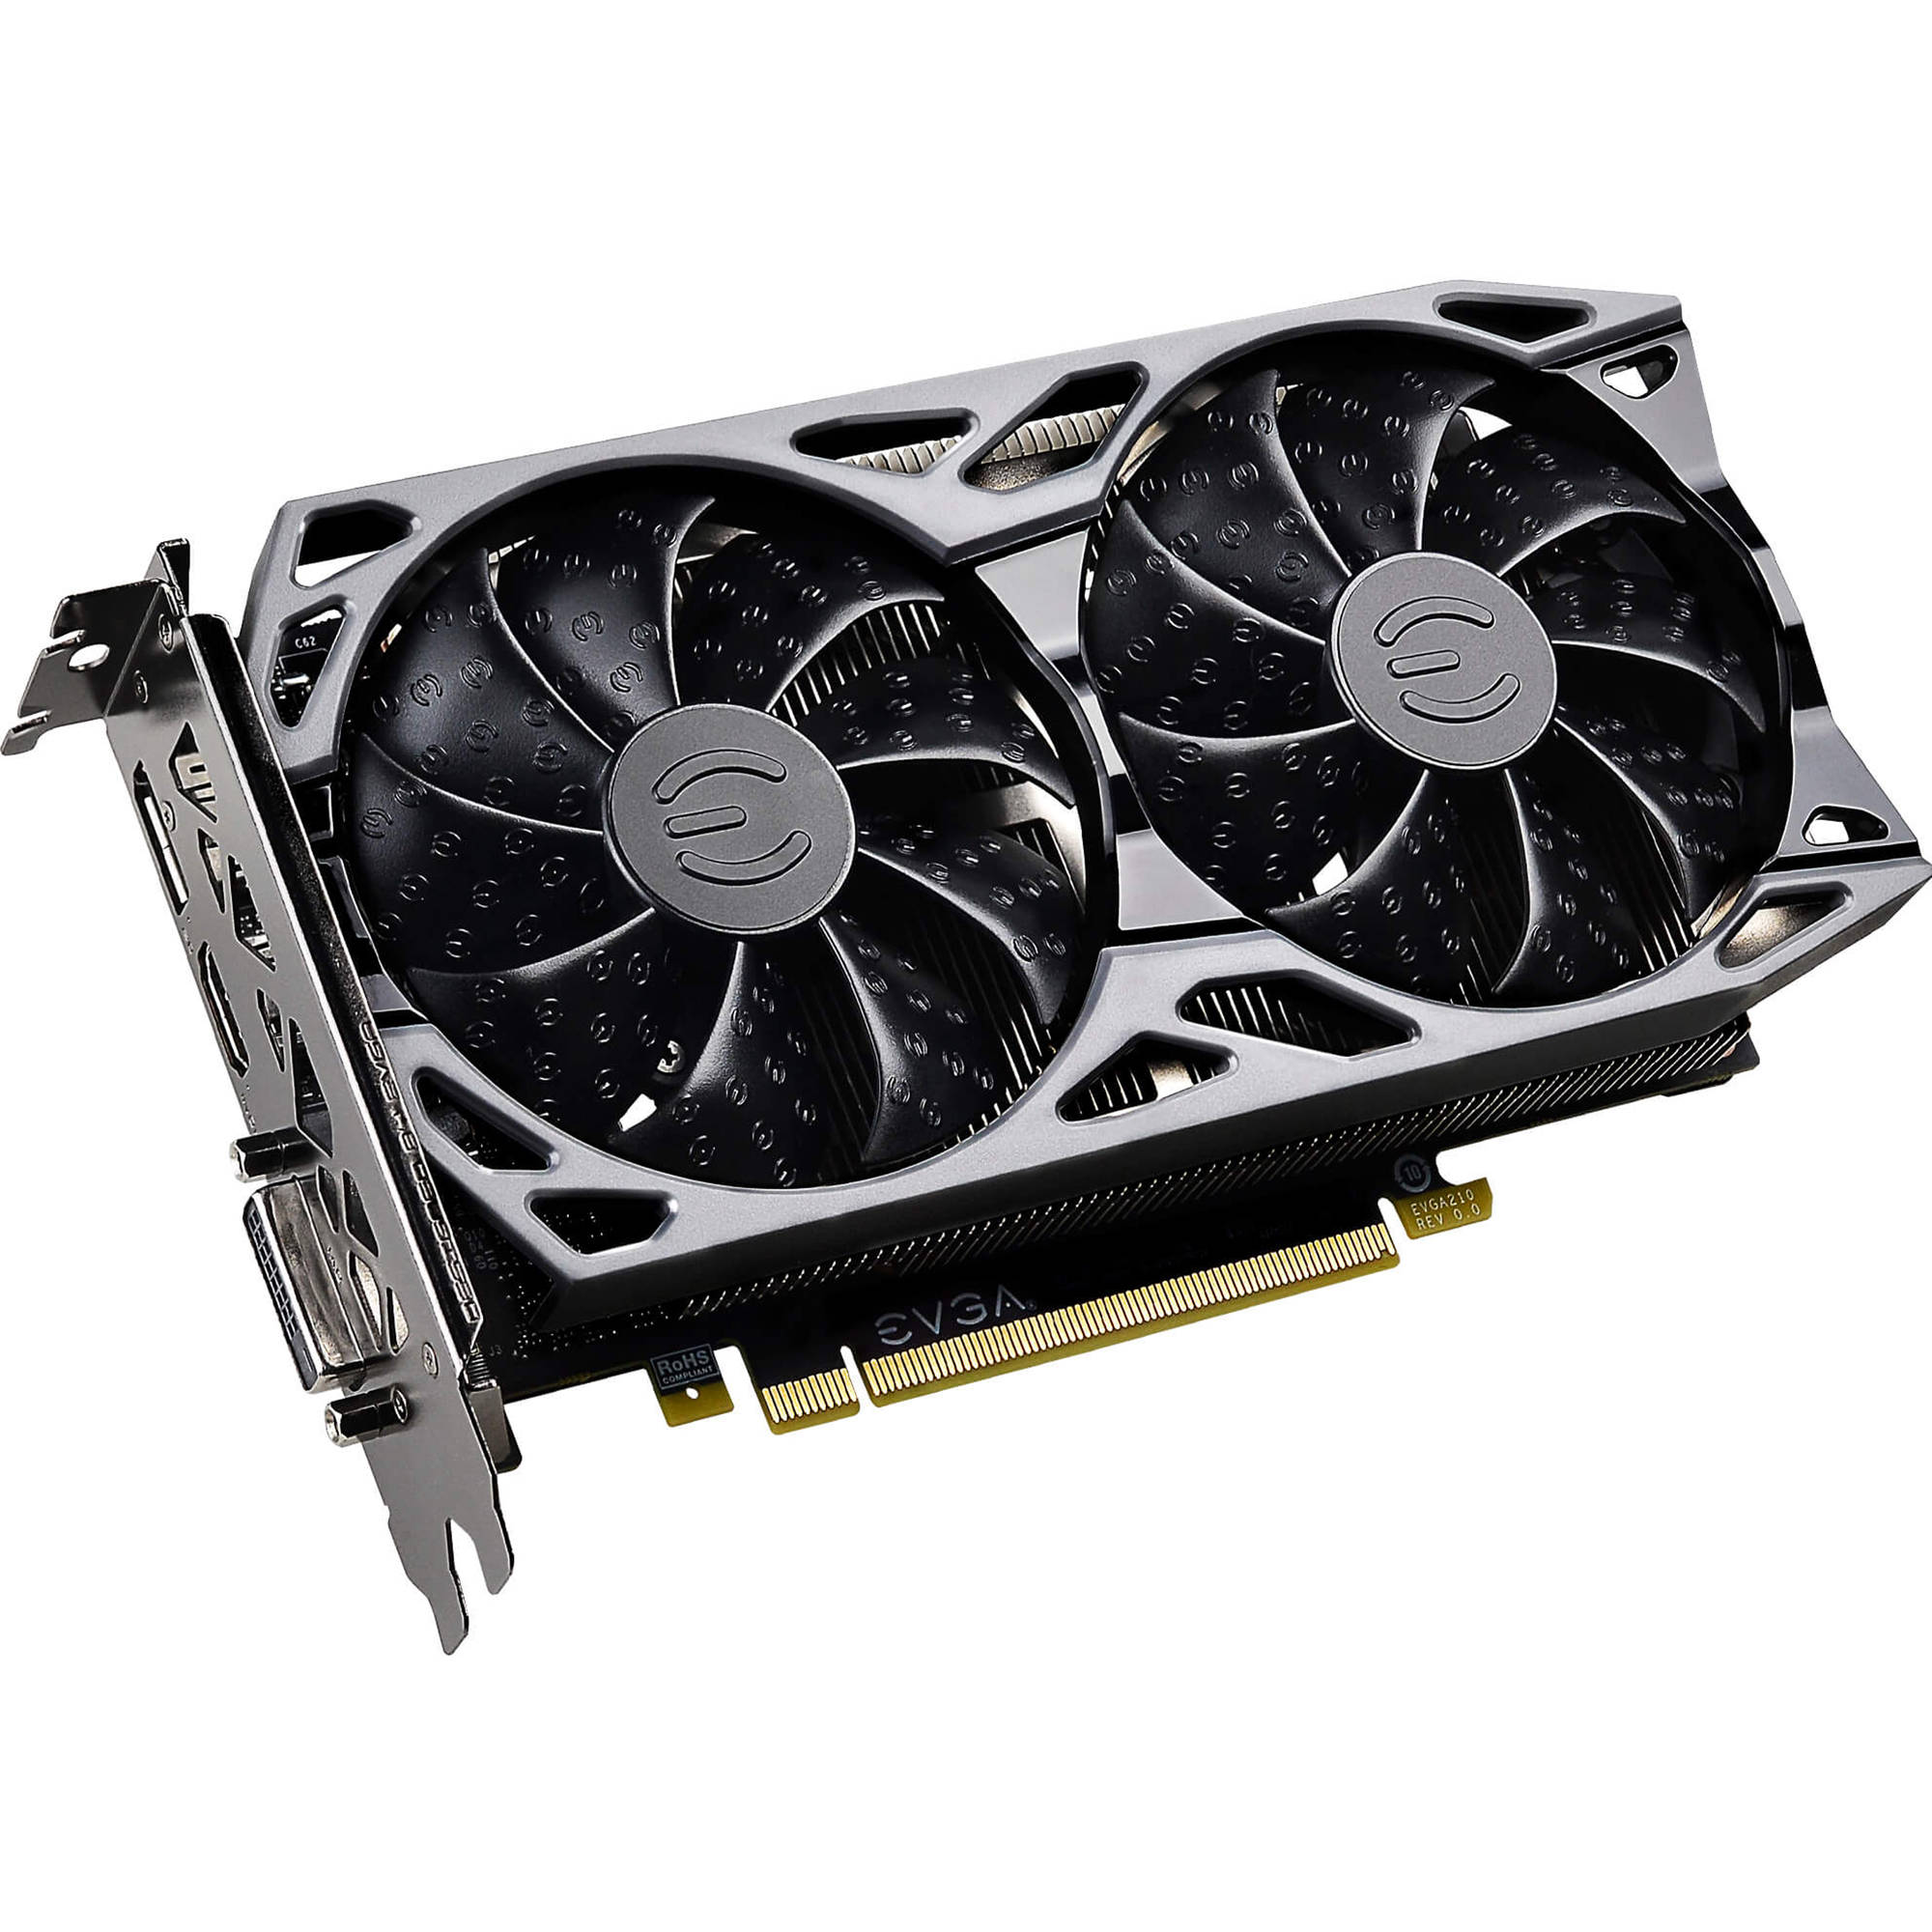 NEW EVGA NVIDIA GeForce GTX 1660 XC GAMING 6GB GDDR5 06G-P4-1163-KR Video Card